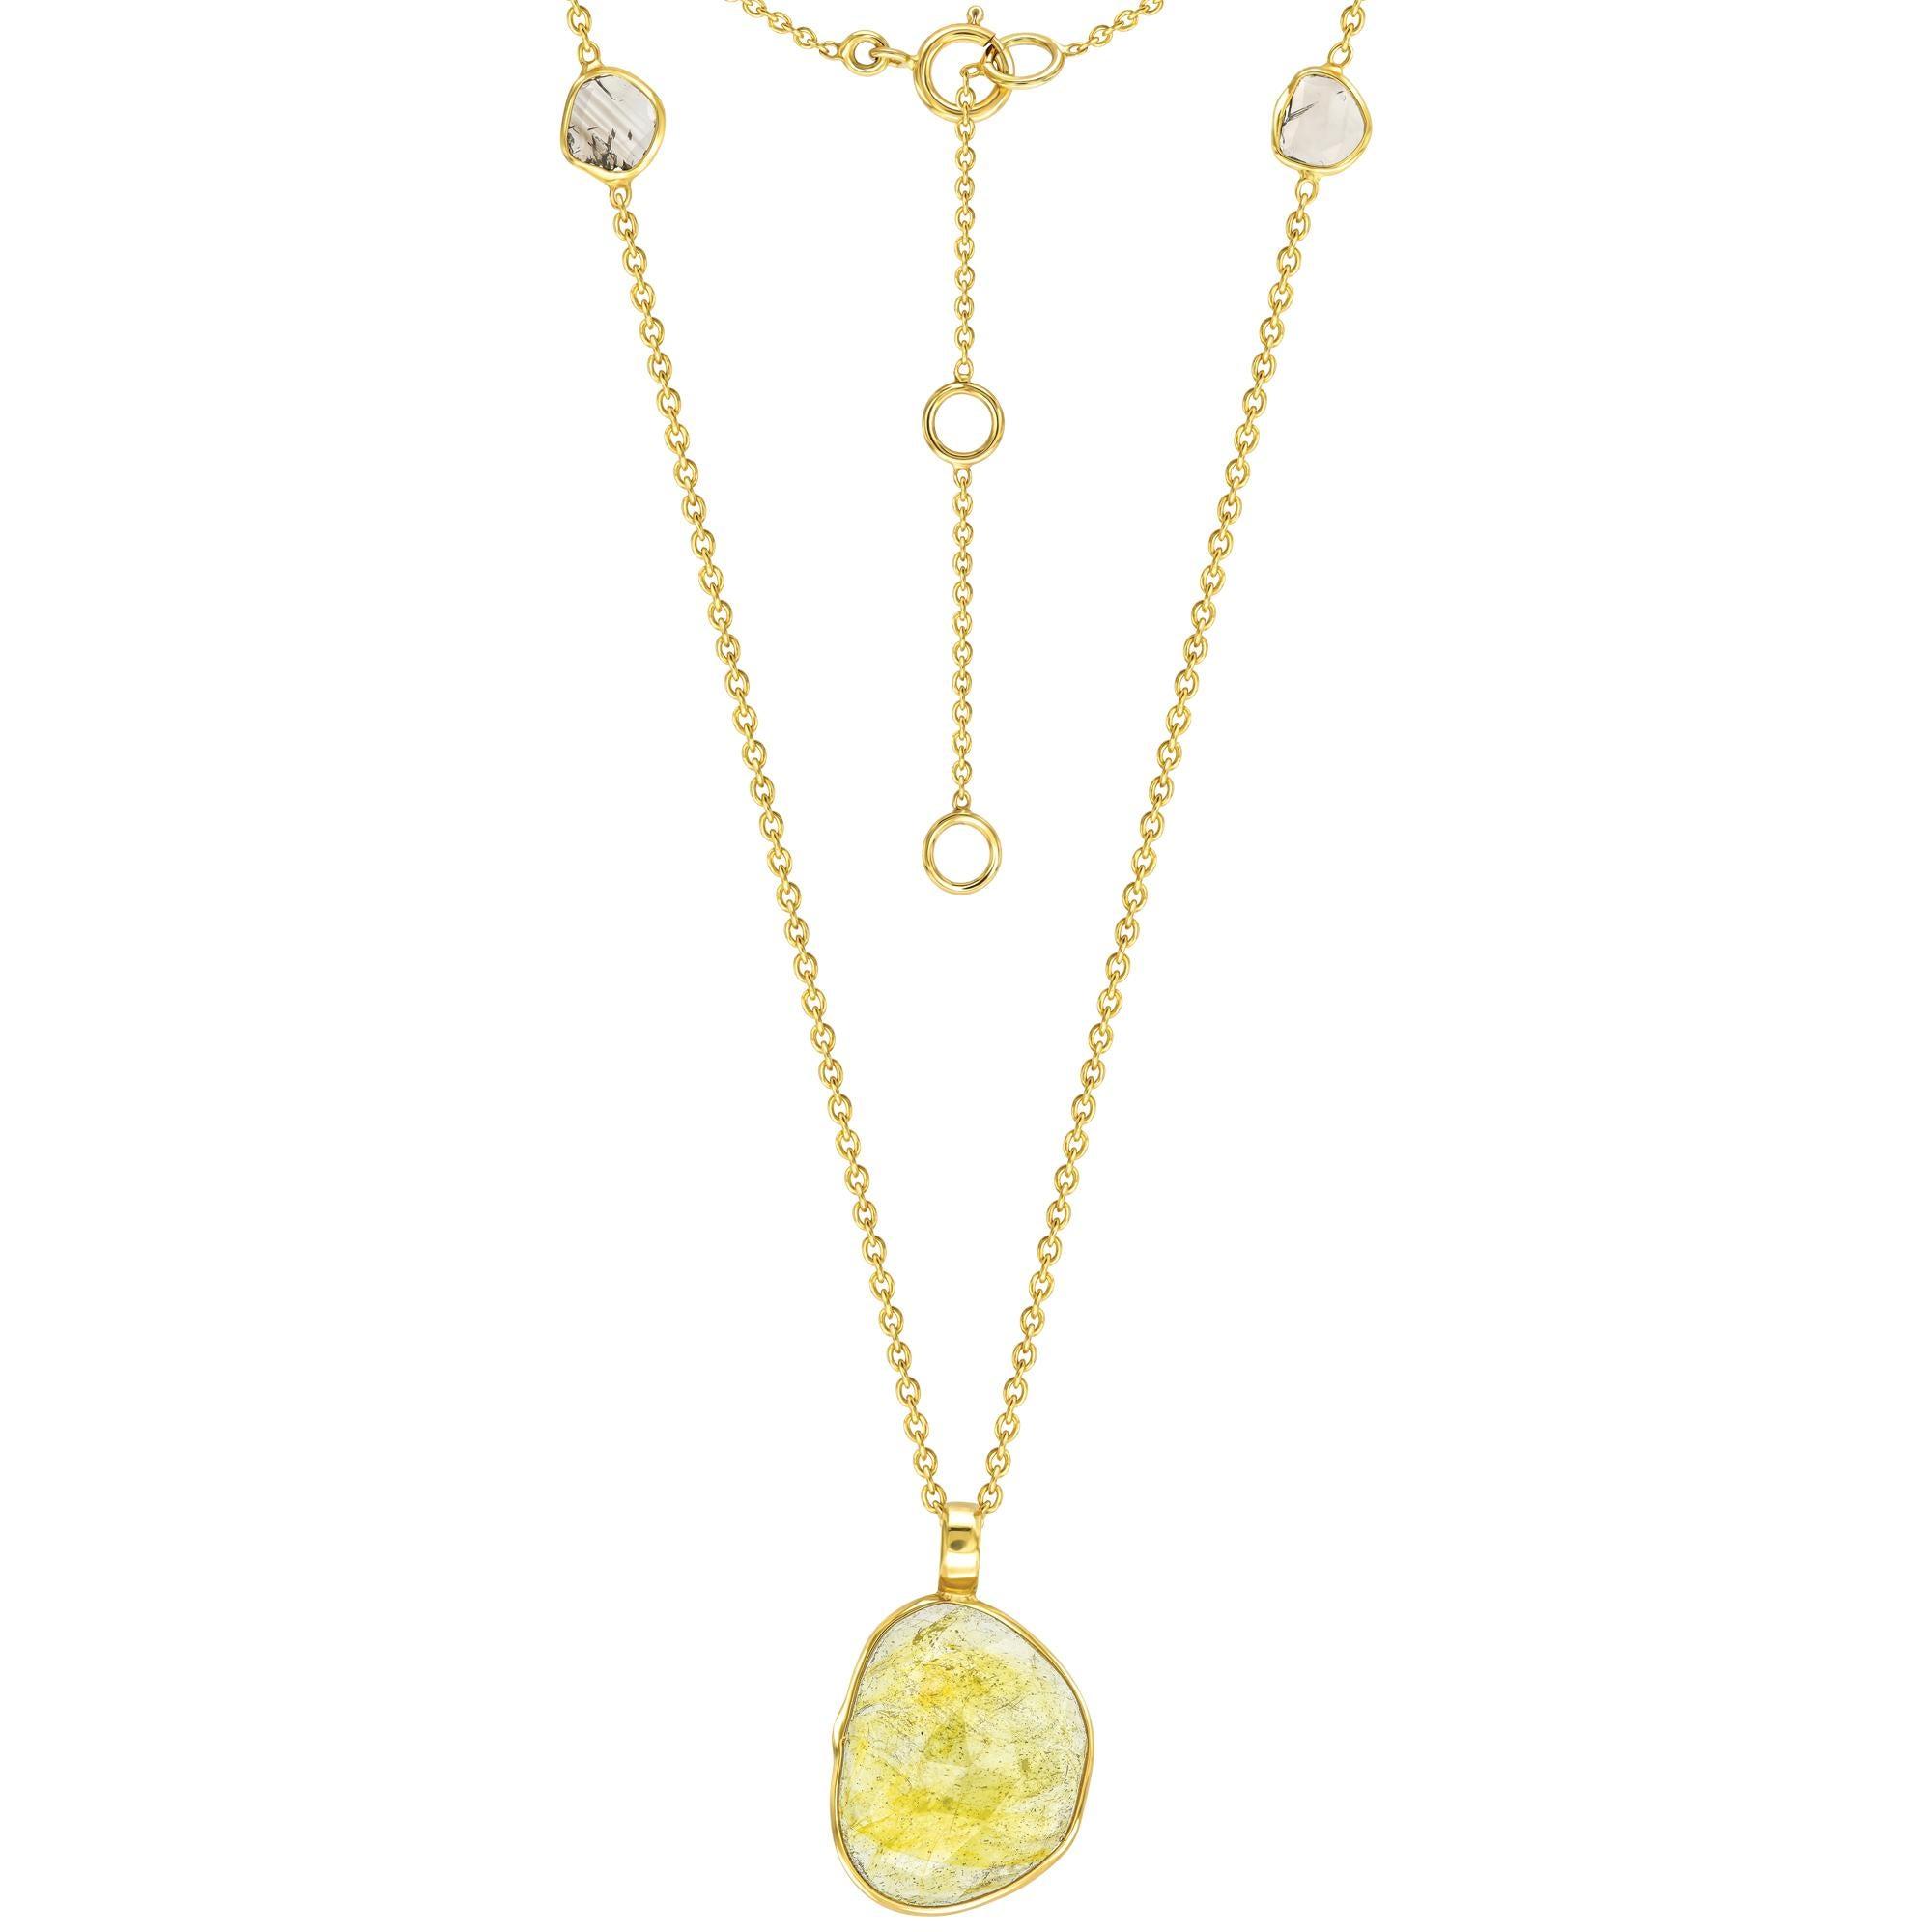 4.94 Carat Sapphire Diamond Rose Cut 18 KT Yellow Gold Pendant Necklace